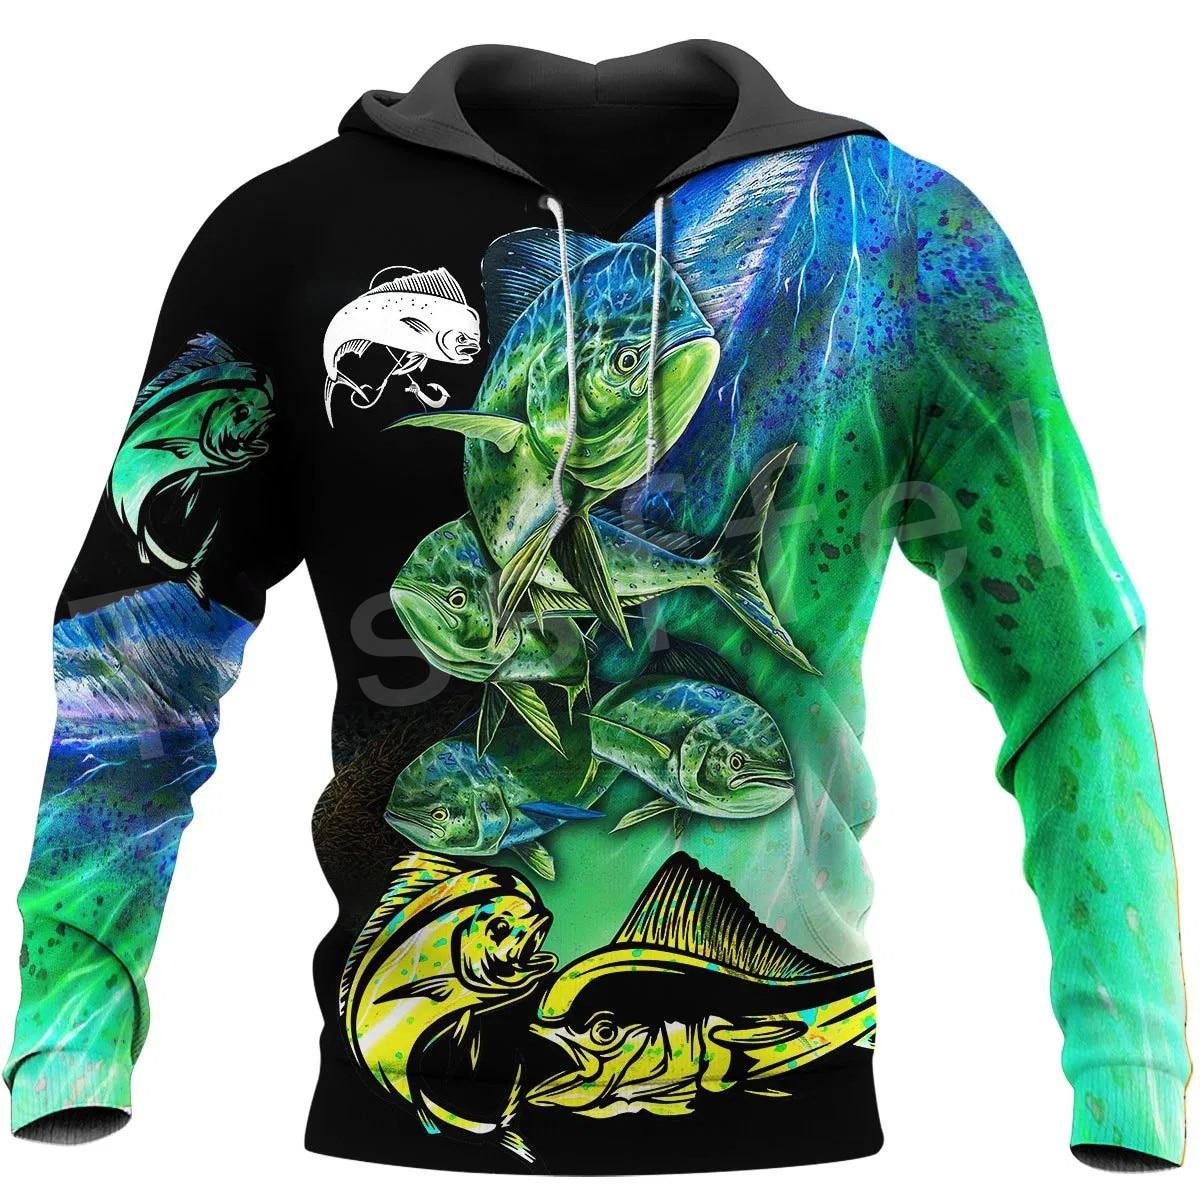 Tessffel New Fashion Animal Camo Bass Fishing Fisher Tracksuit Harajuku Unisex 3DPrinted Zipper/Hoodies/Sweatshirts/Jacket s-13